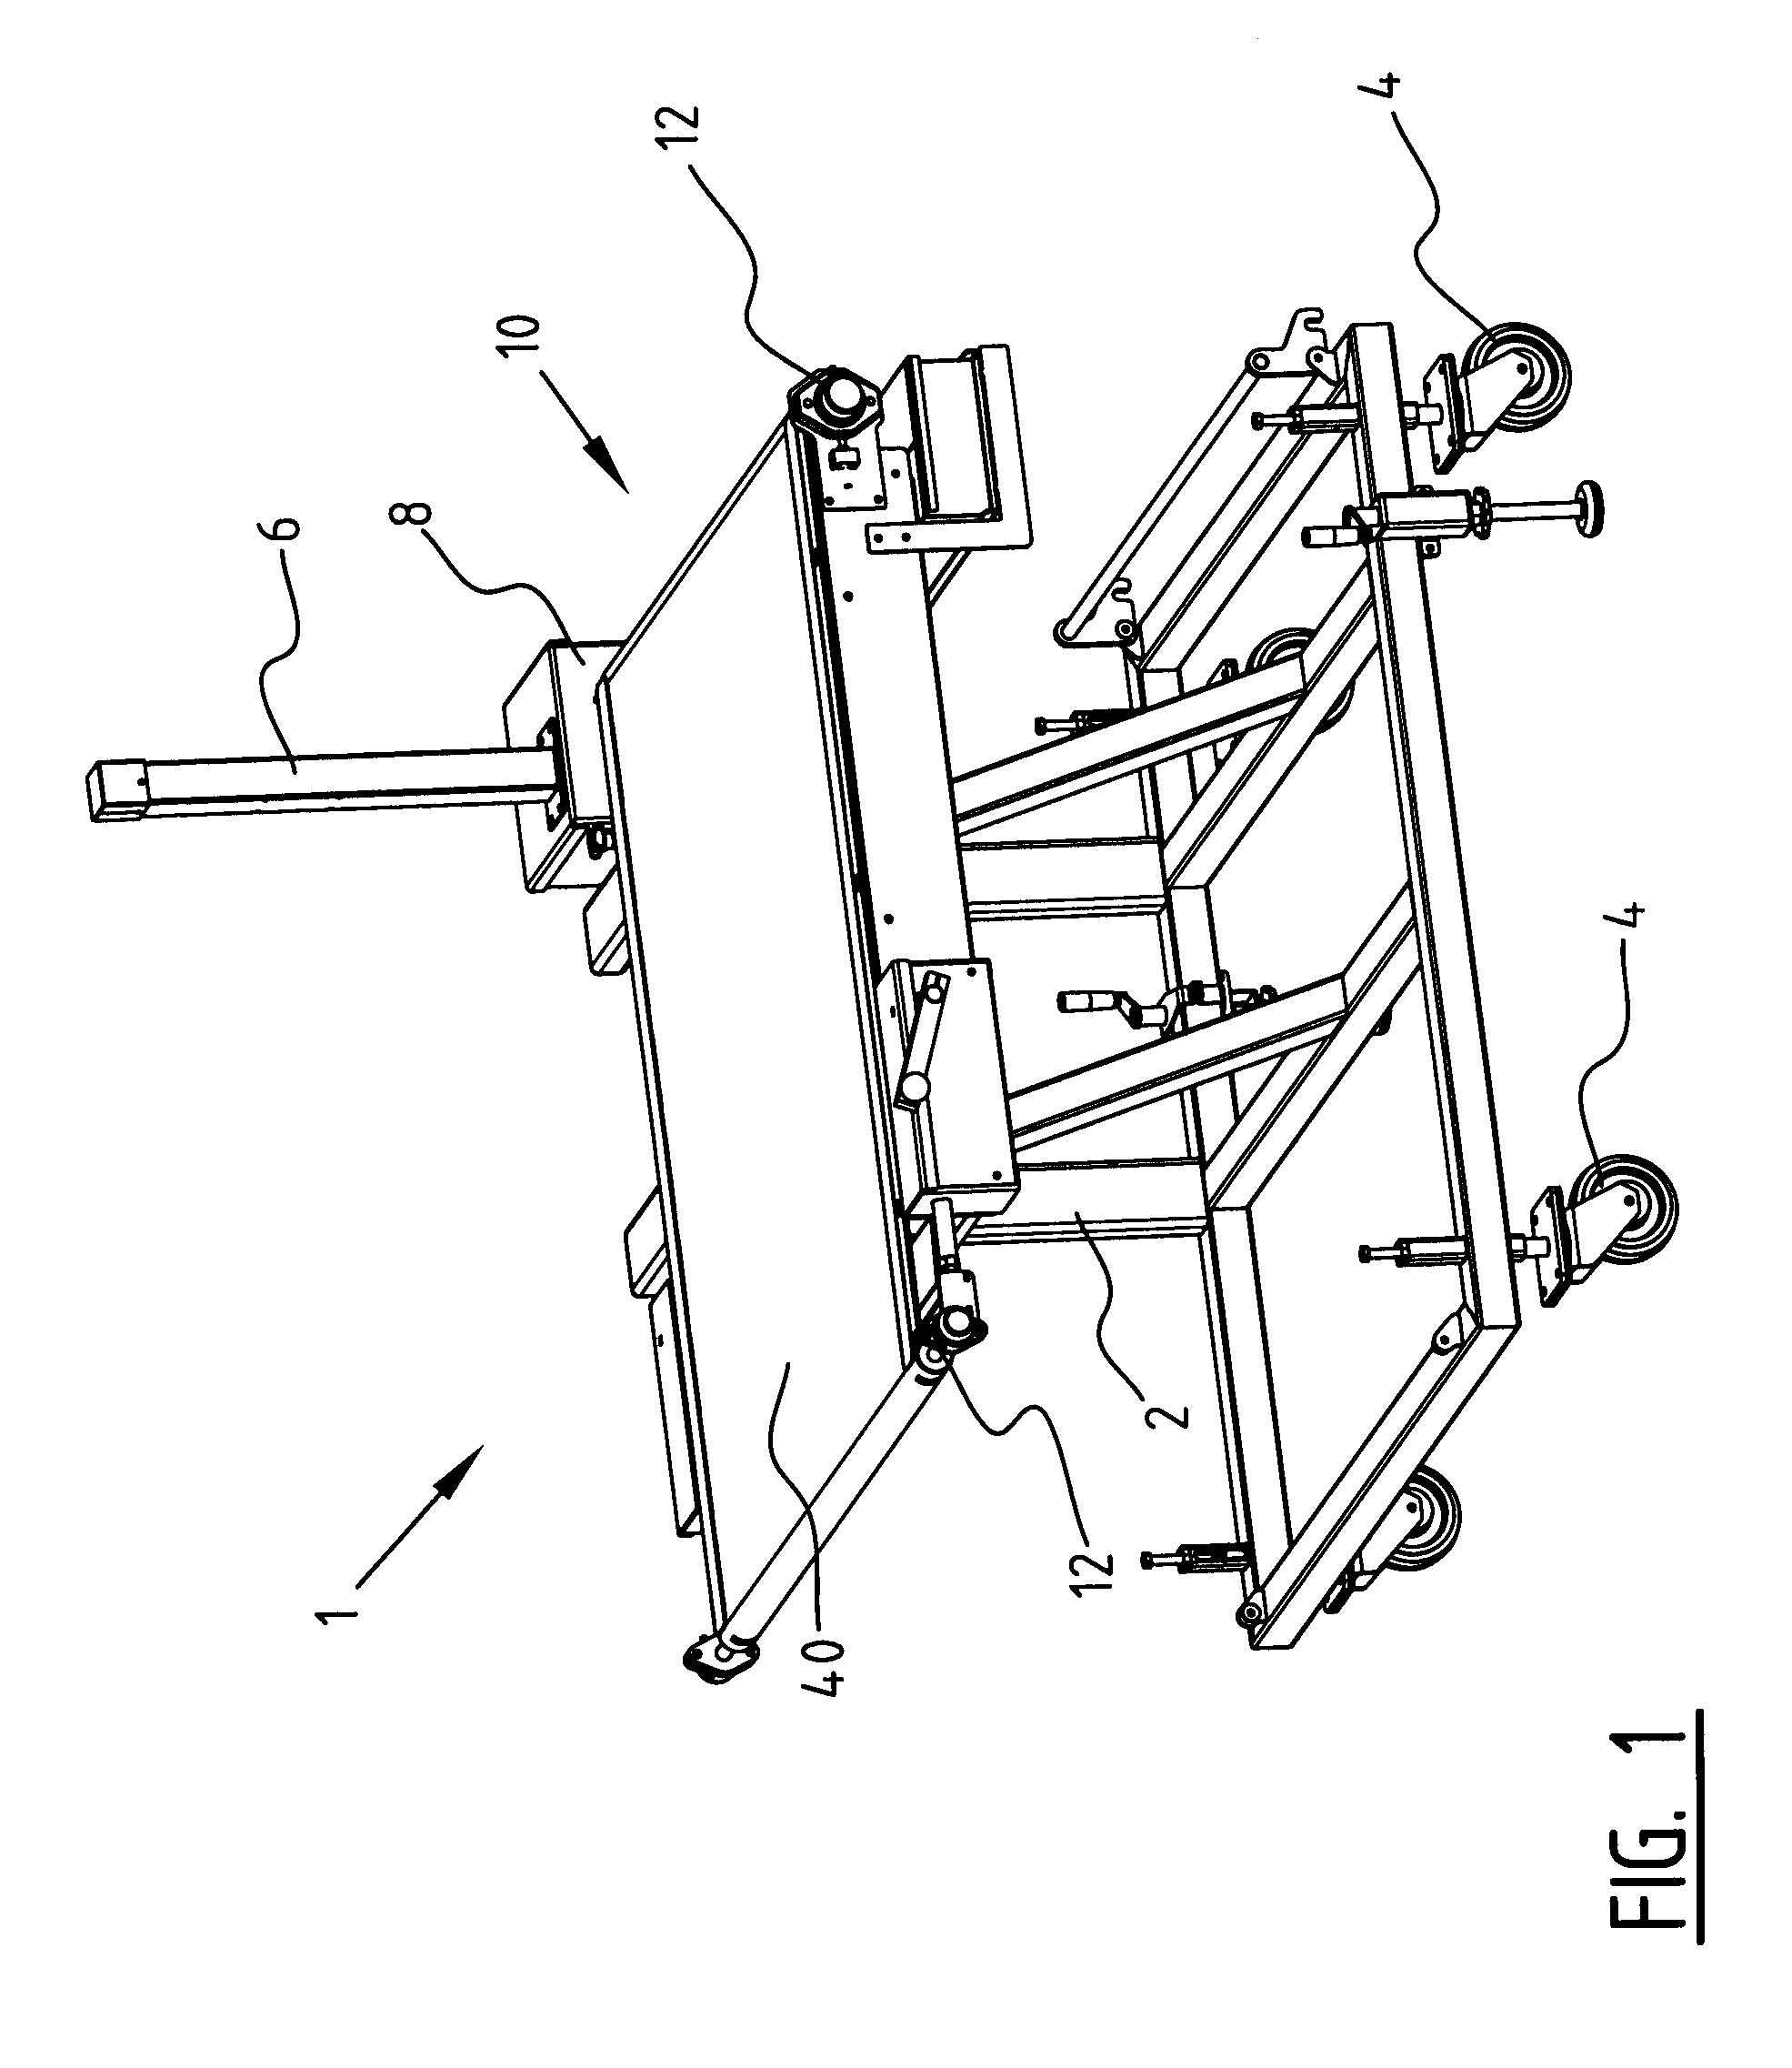 Conveyor Belt Load Cell